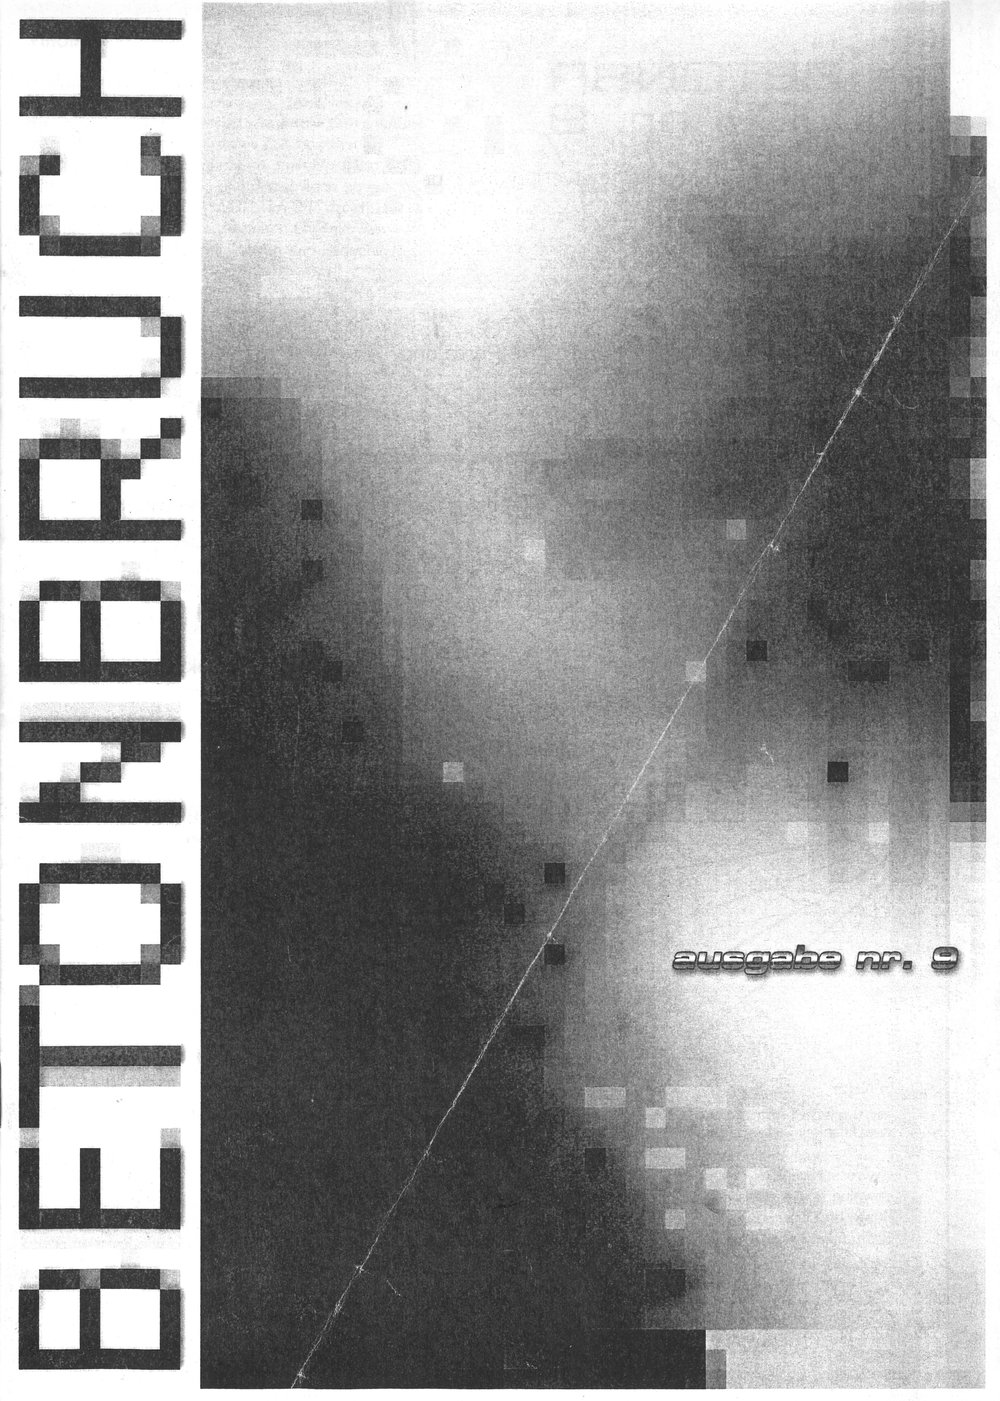 BETONBRUCH_9_COVER_mini.jpg